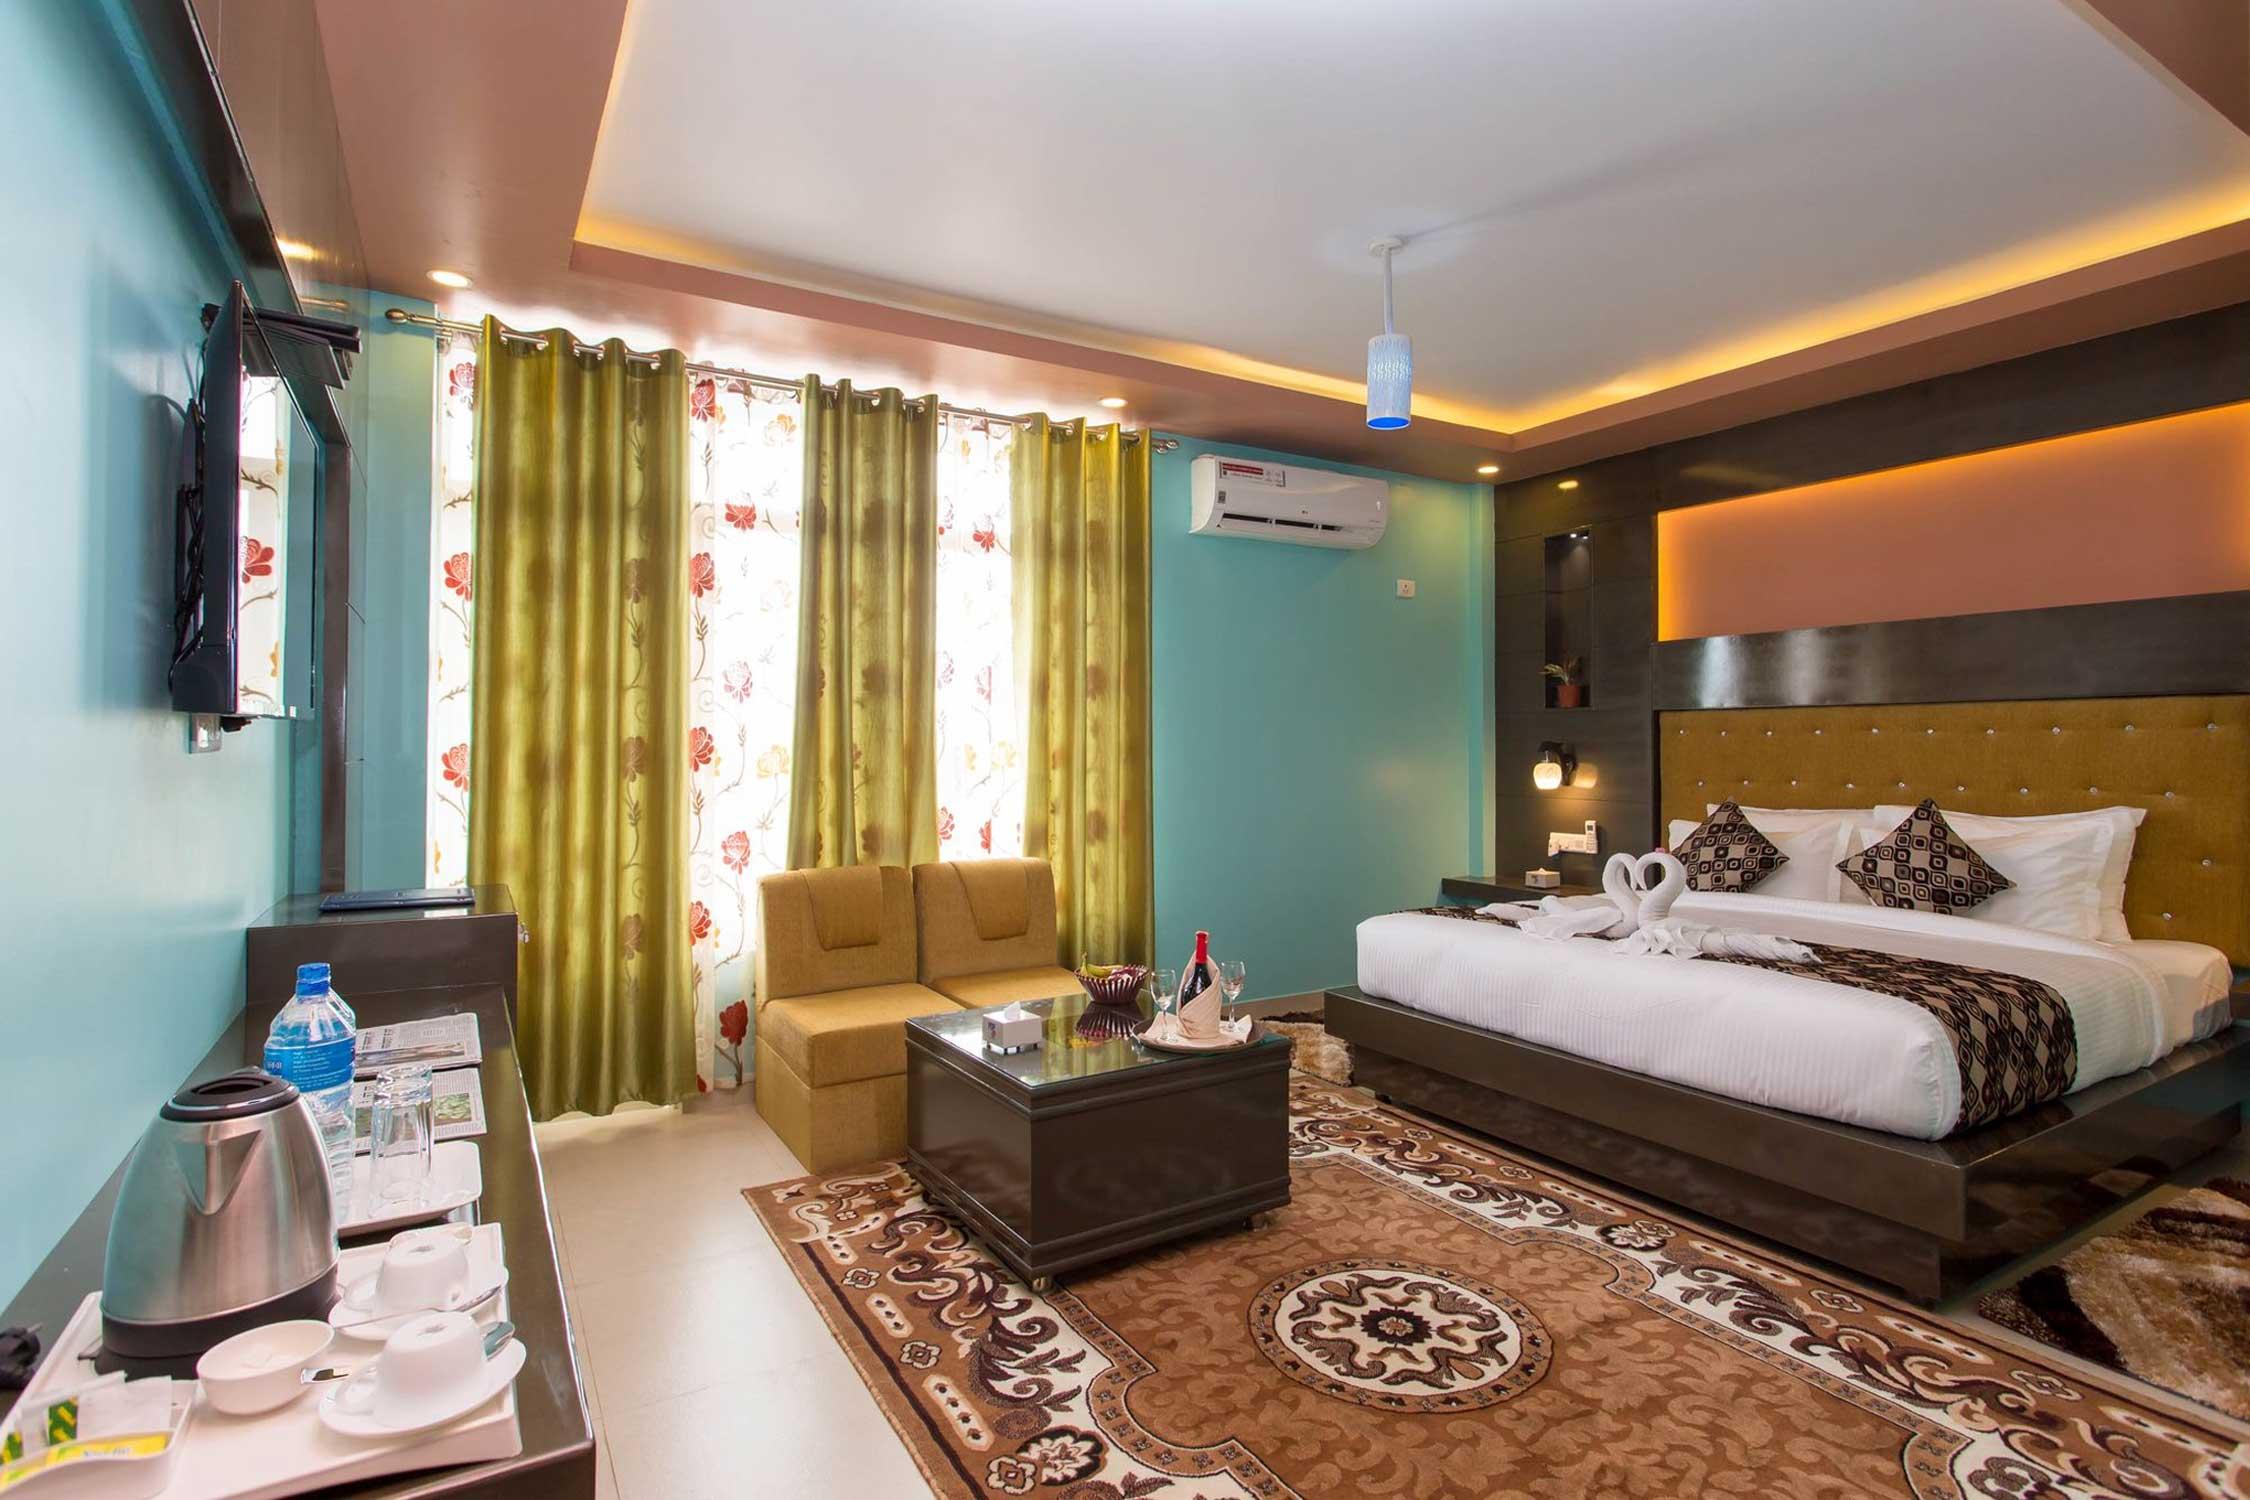 Siddhartha New Hotel Anand, Mahendranagar